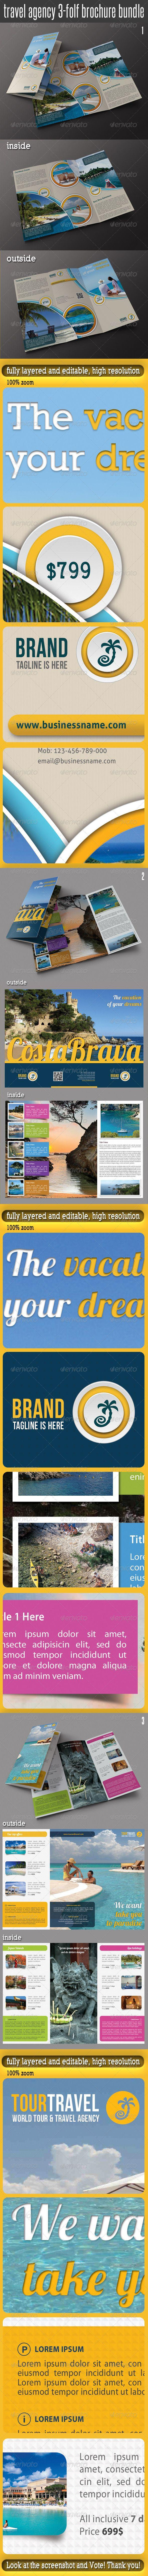 Travel Agency 3-Fold Brochure Bundle #GraphicRiver A clean, crisp, high impact, multiuse PSD brochure Template Layout,